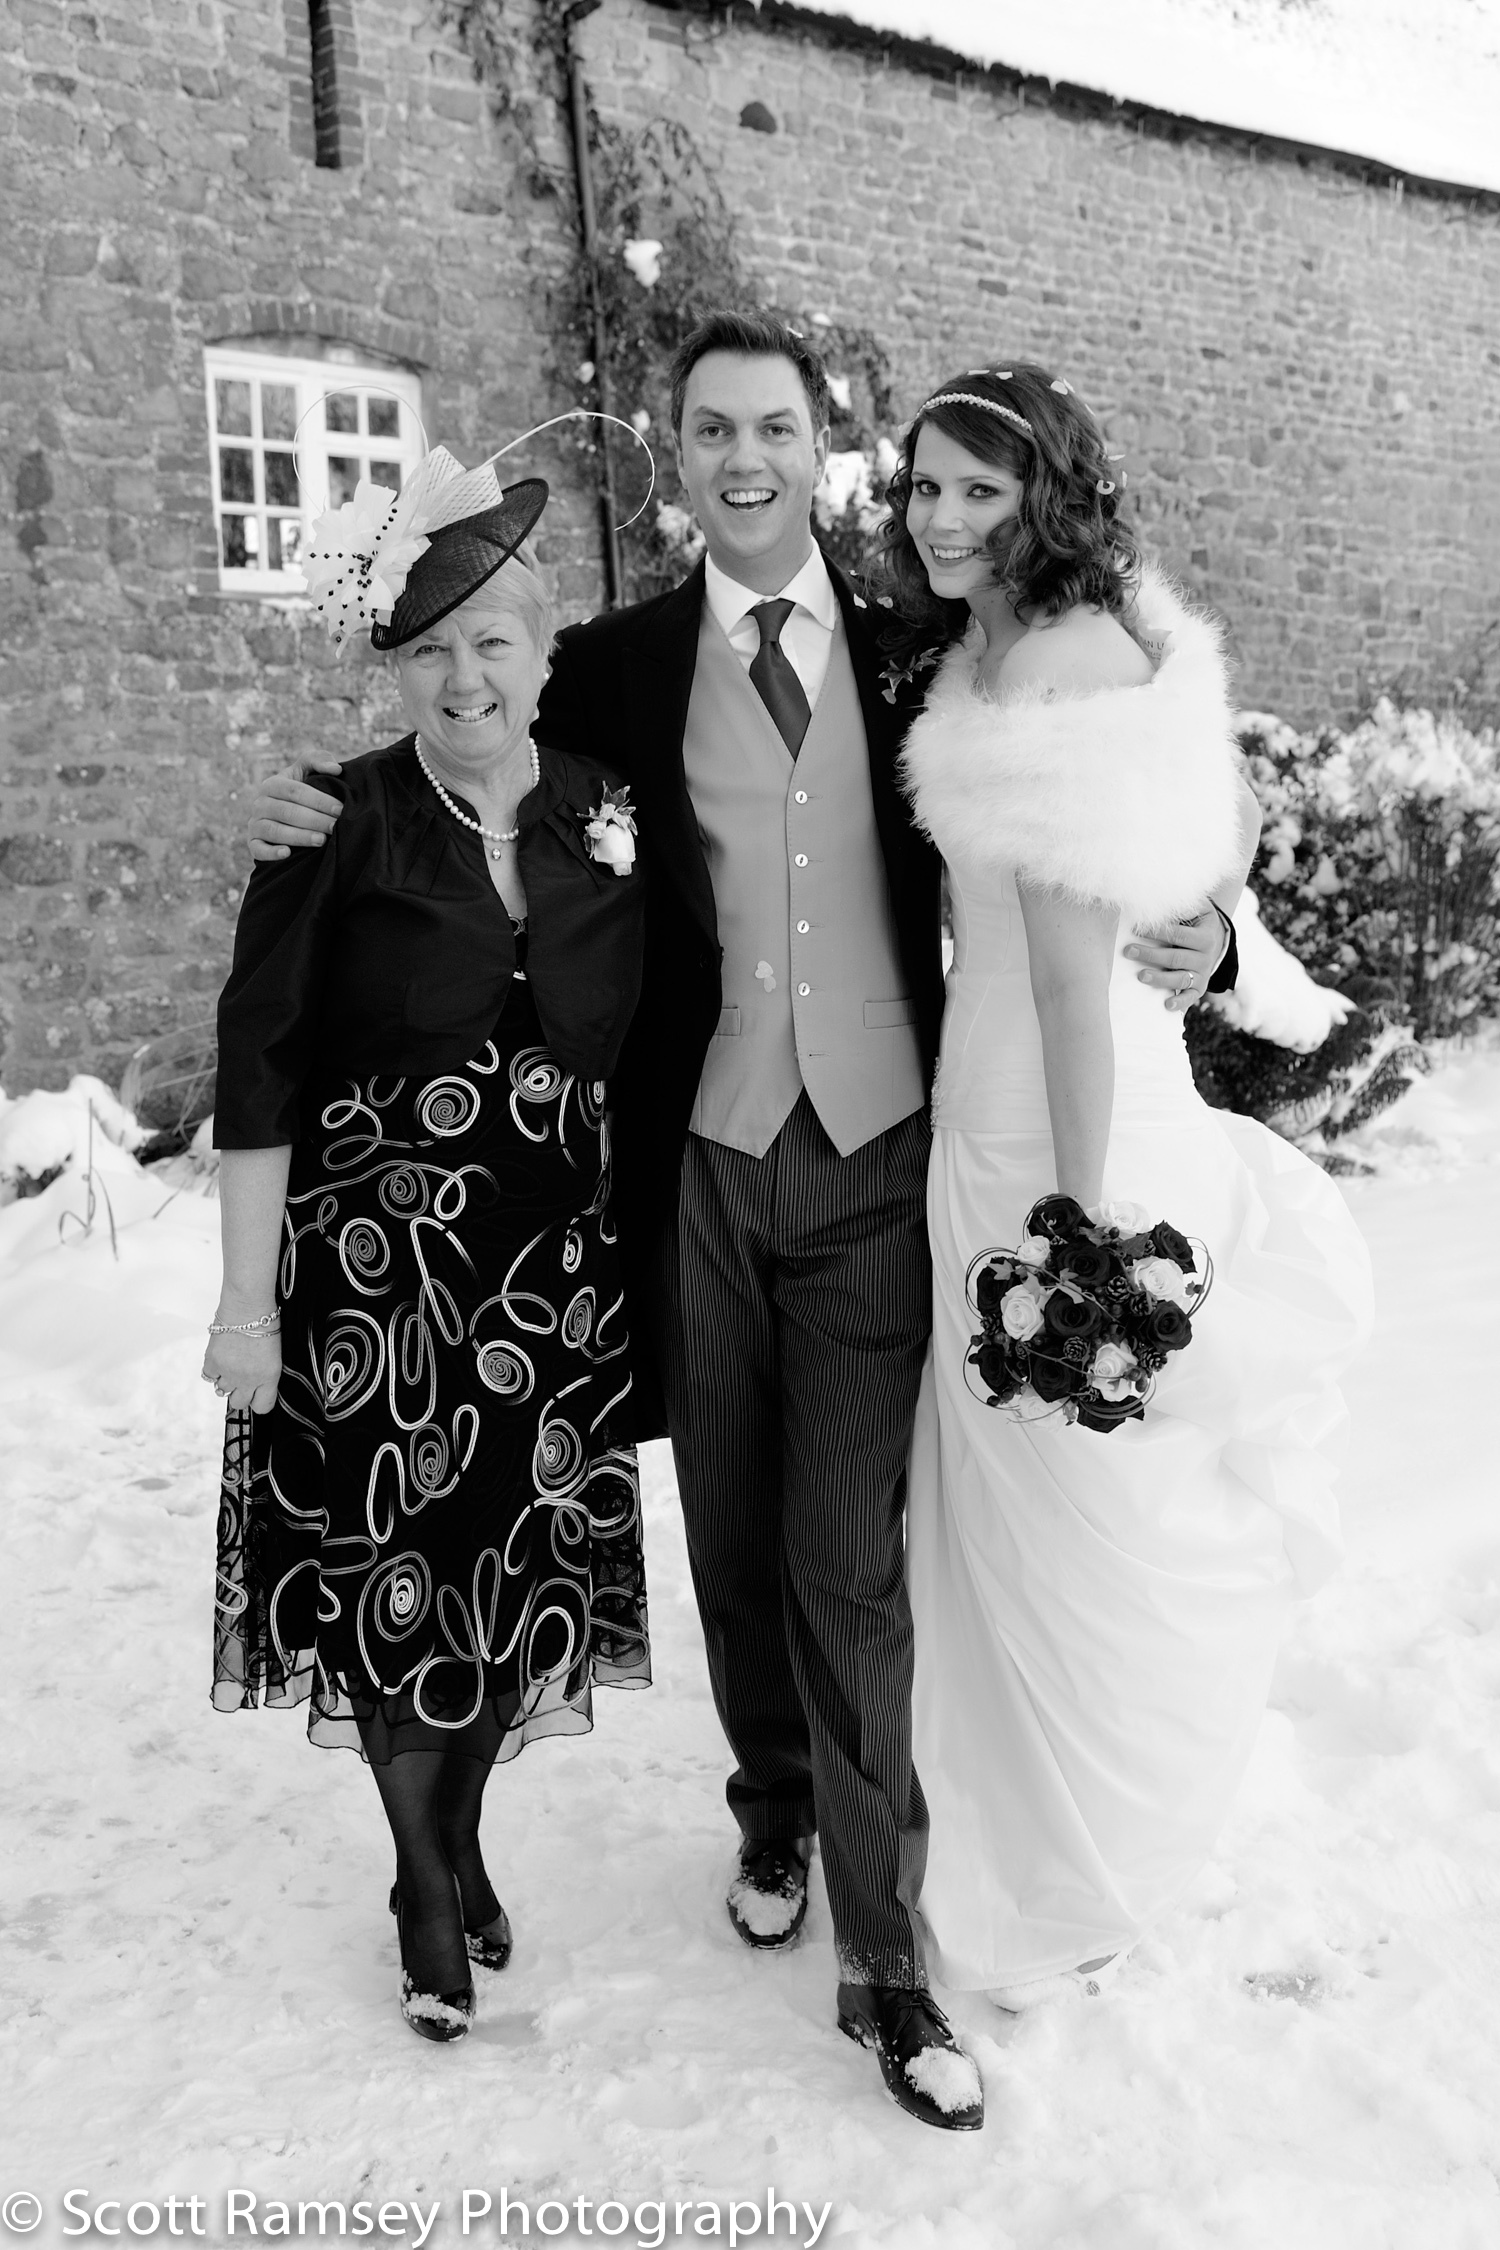 Winter-Wedding-Spread-Eagle-Hotel-Midhurst-Happy-Bride-Groom-Mum